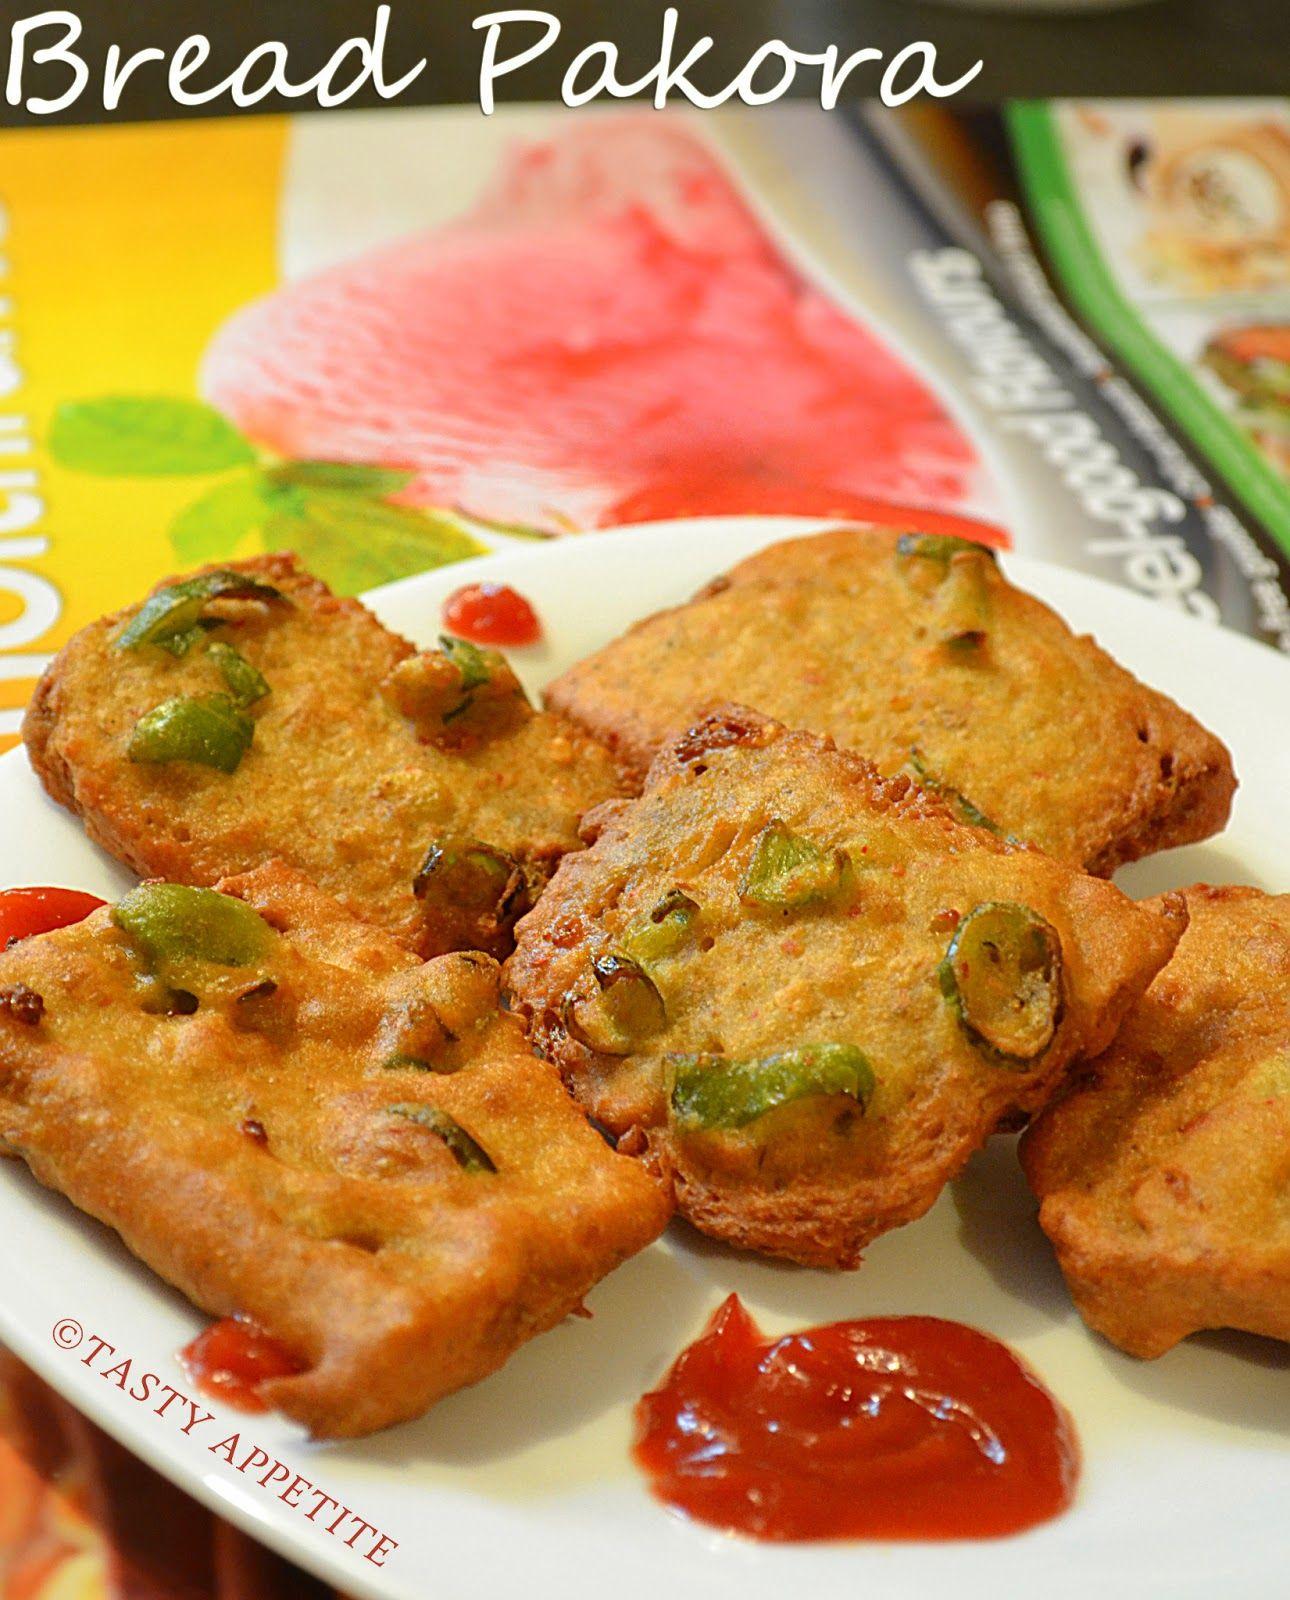 How to make Bread Pakora / Fritter Recipes / Indian Snacks